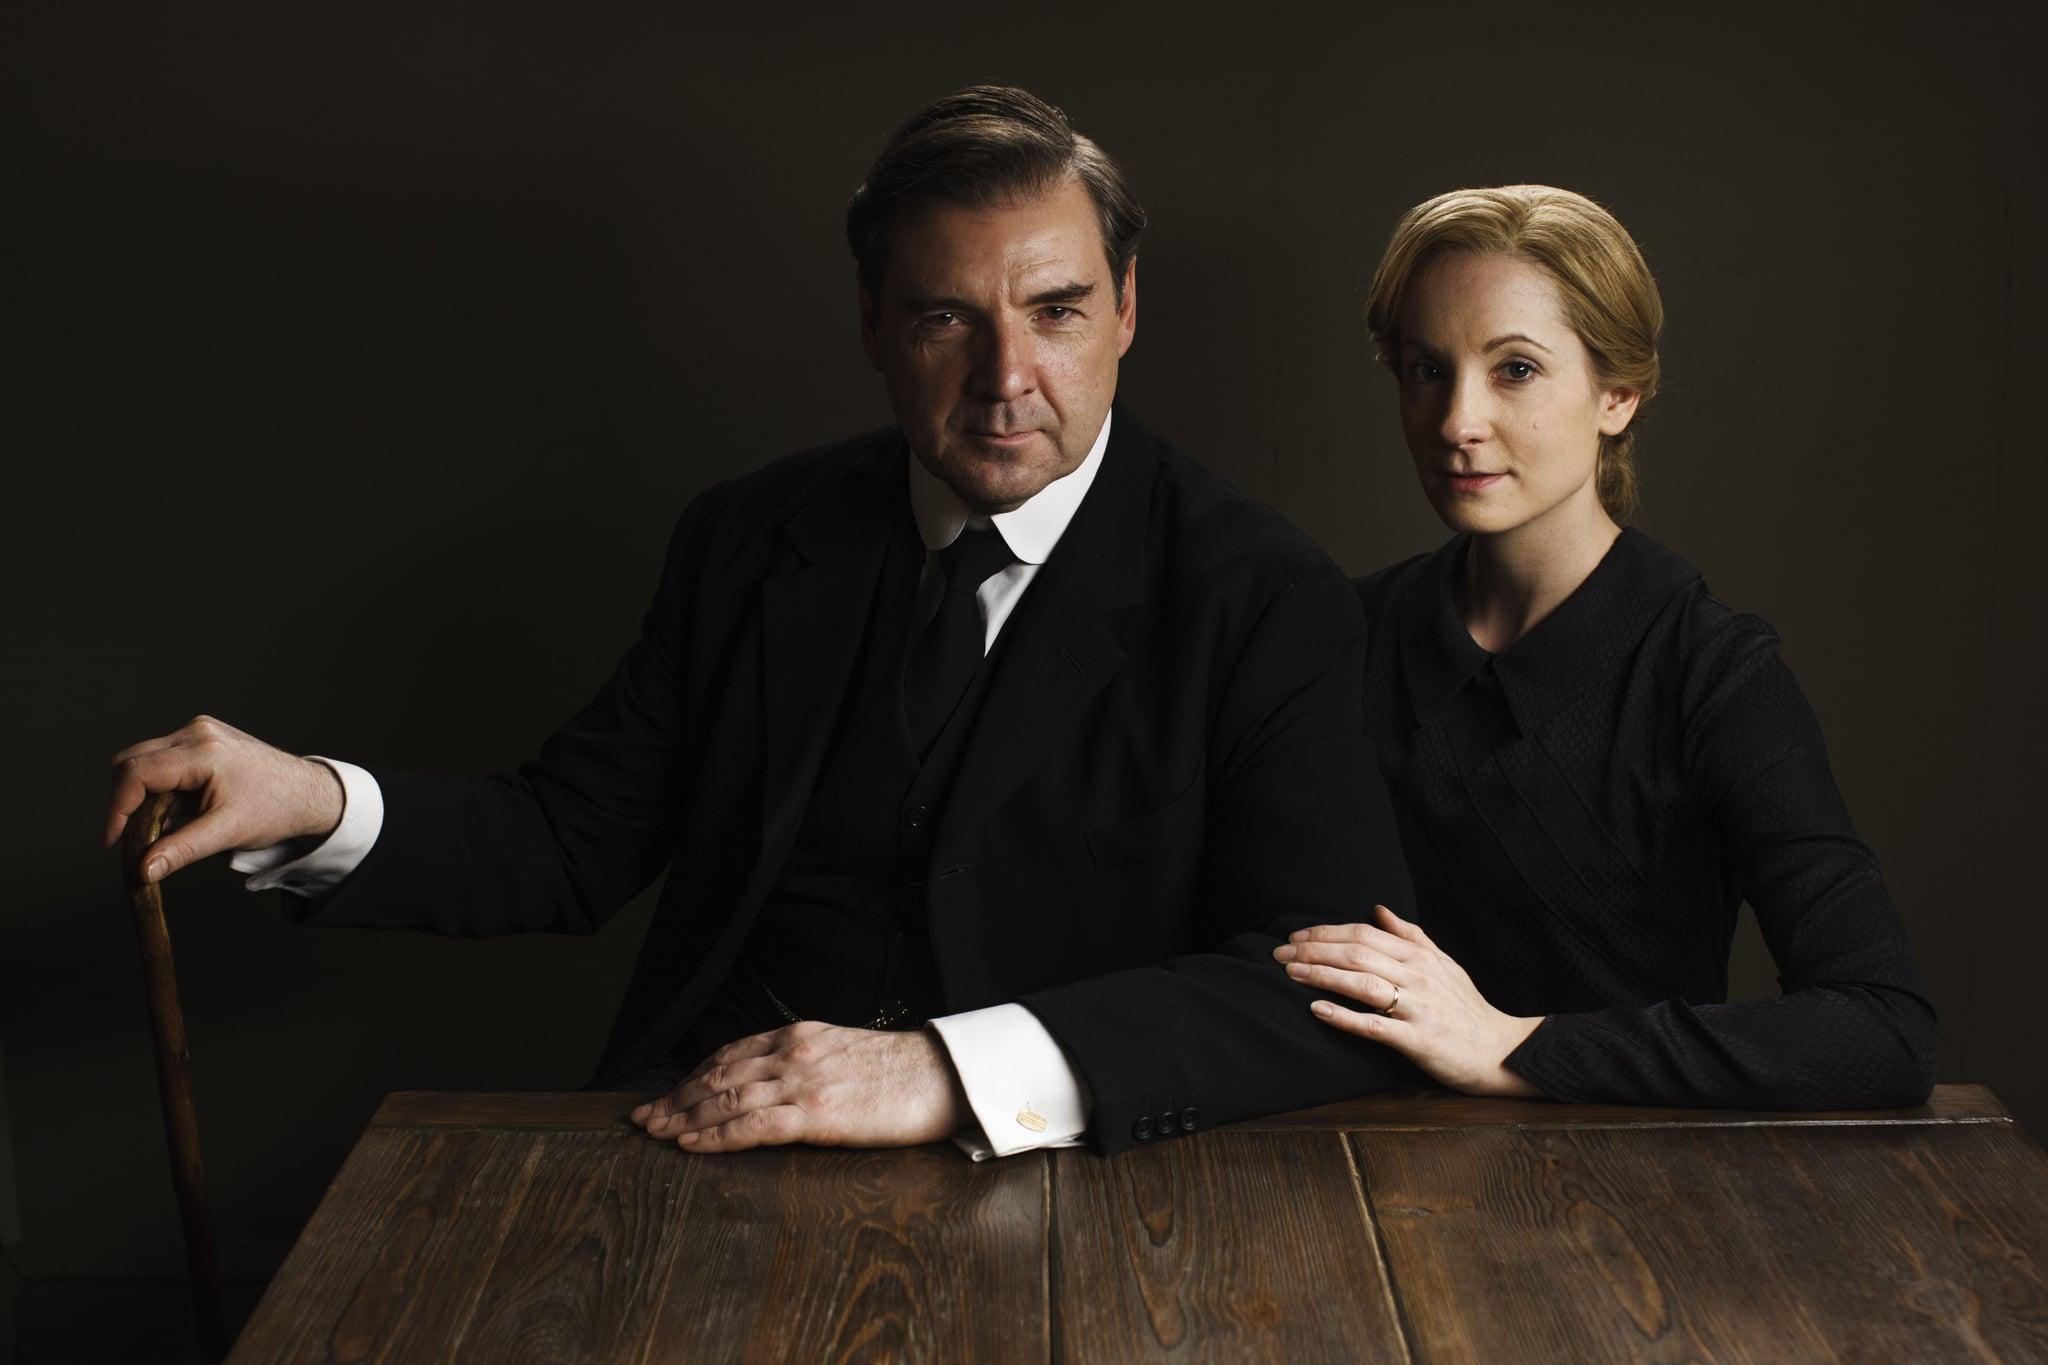 John Bates (Brendan Coyle) and Anna Bates (Joanne Froggatt) look serious.